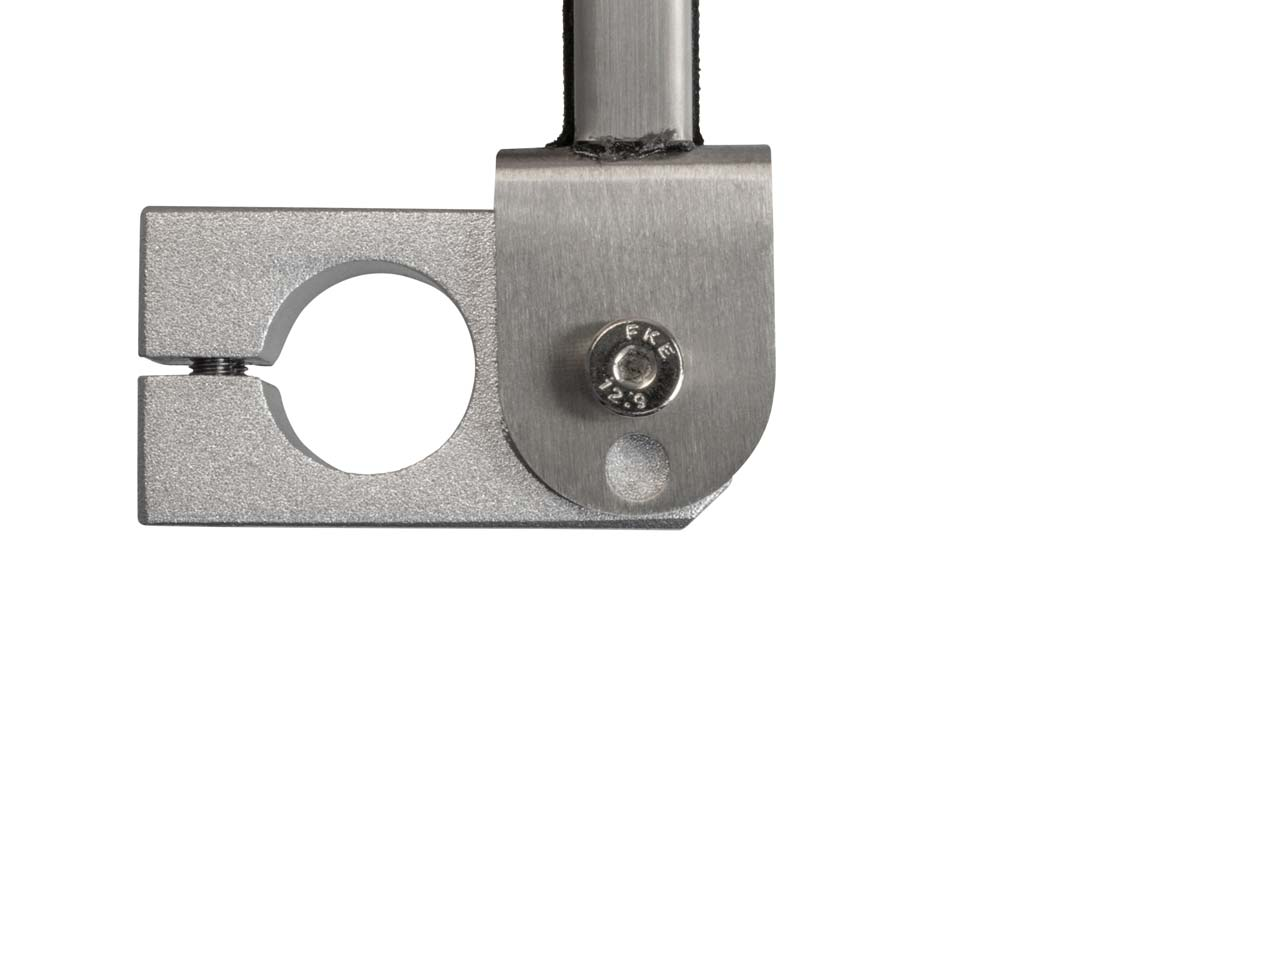 Genuine-US-Foredom-Workbench-Accessories-System miniatura 52